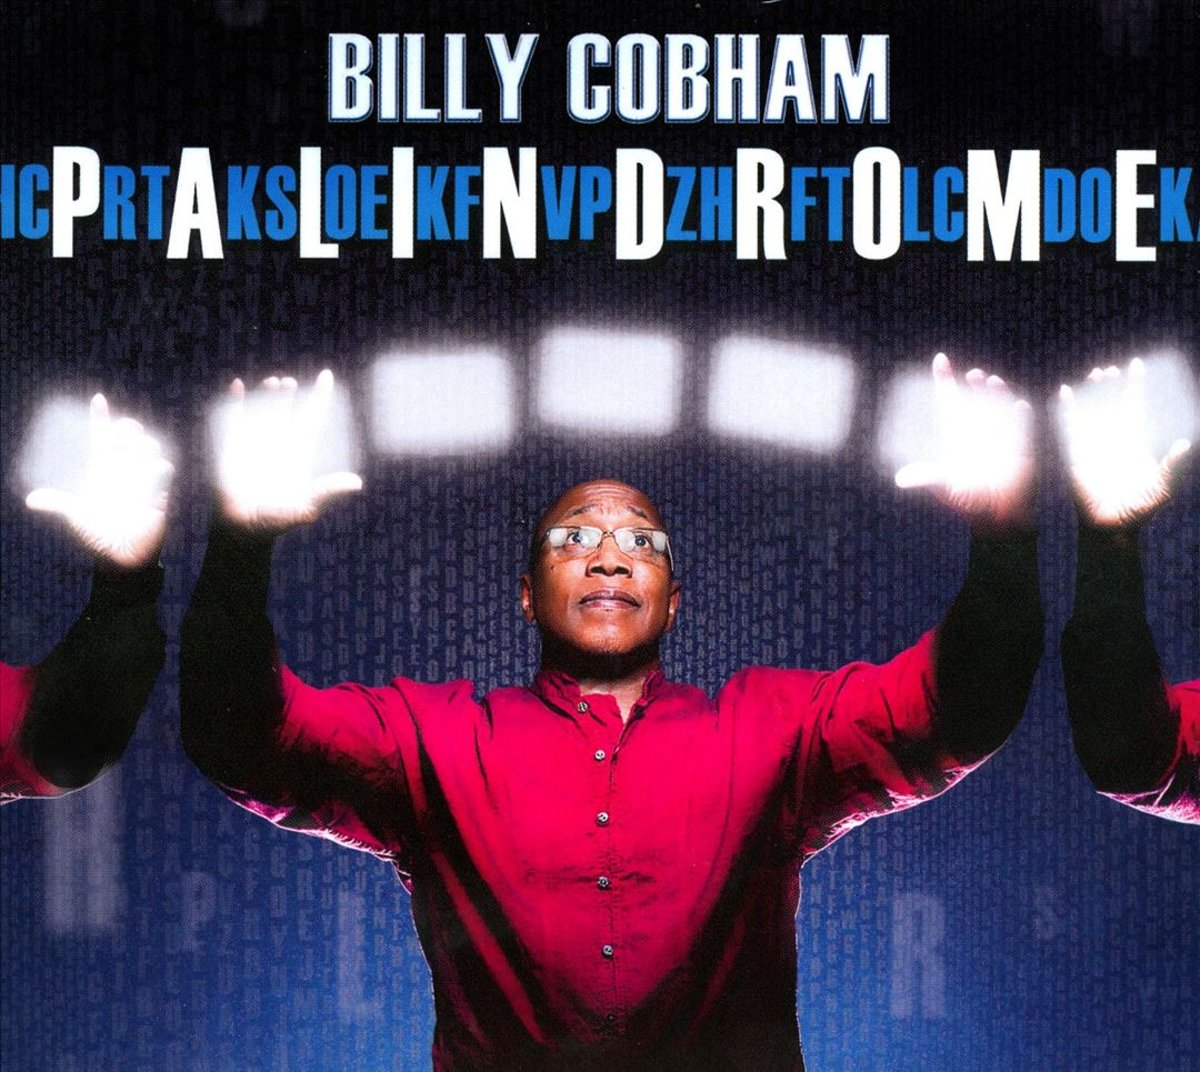 Billy Cobham. Palindrome